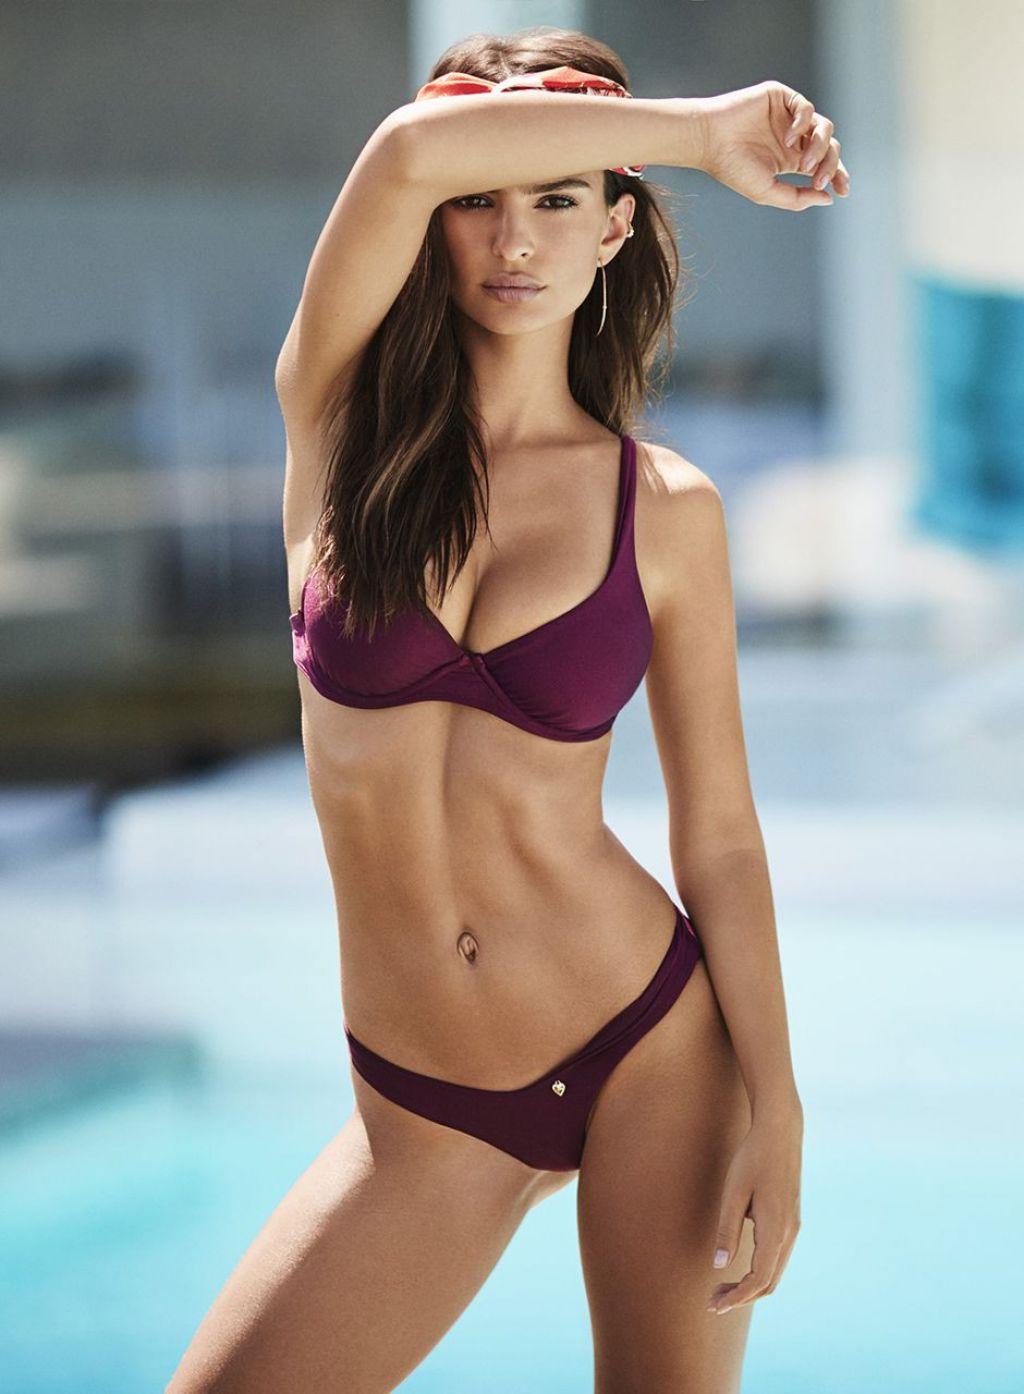 Acacia rose bikini